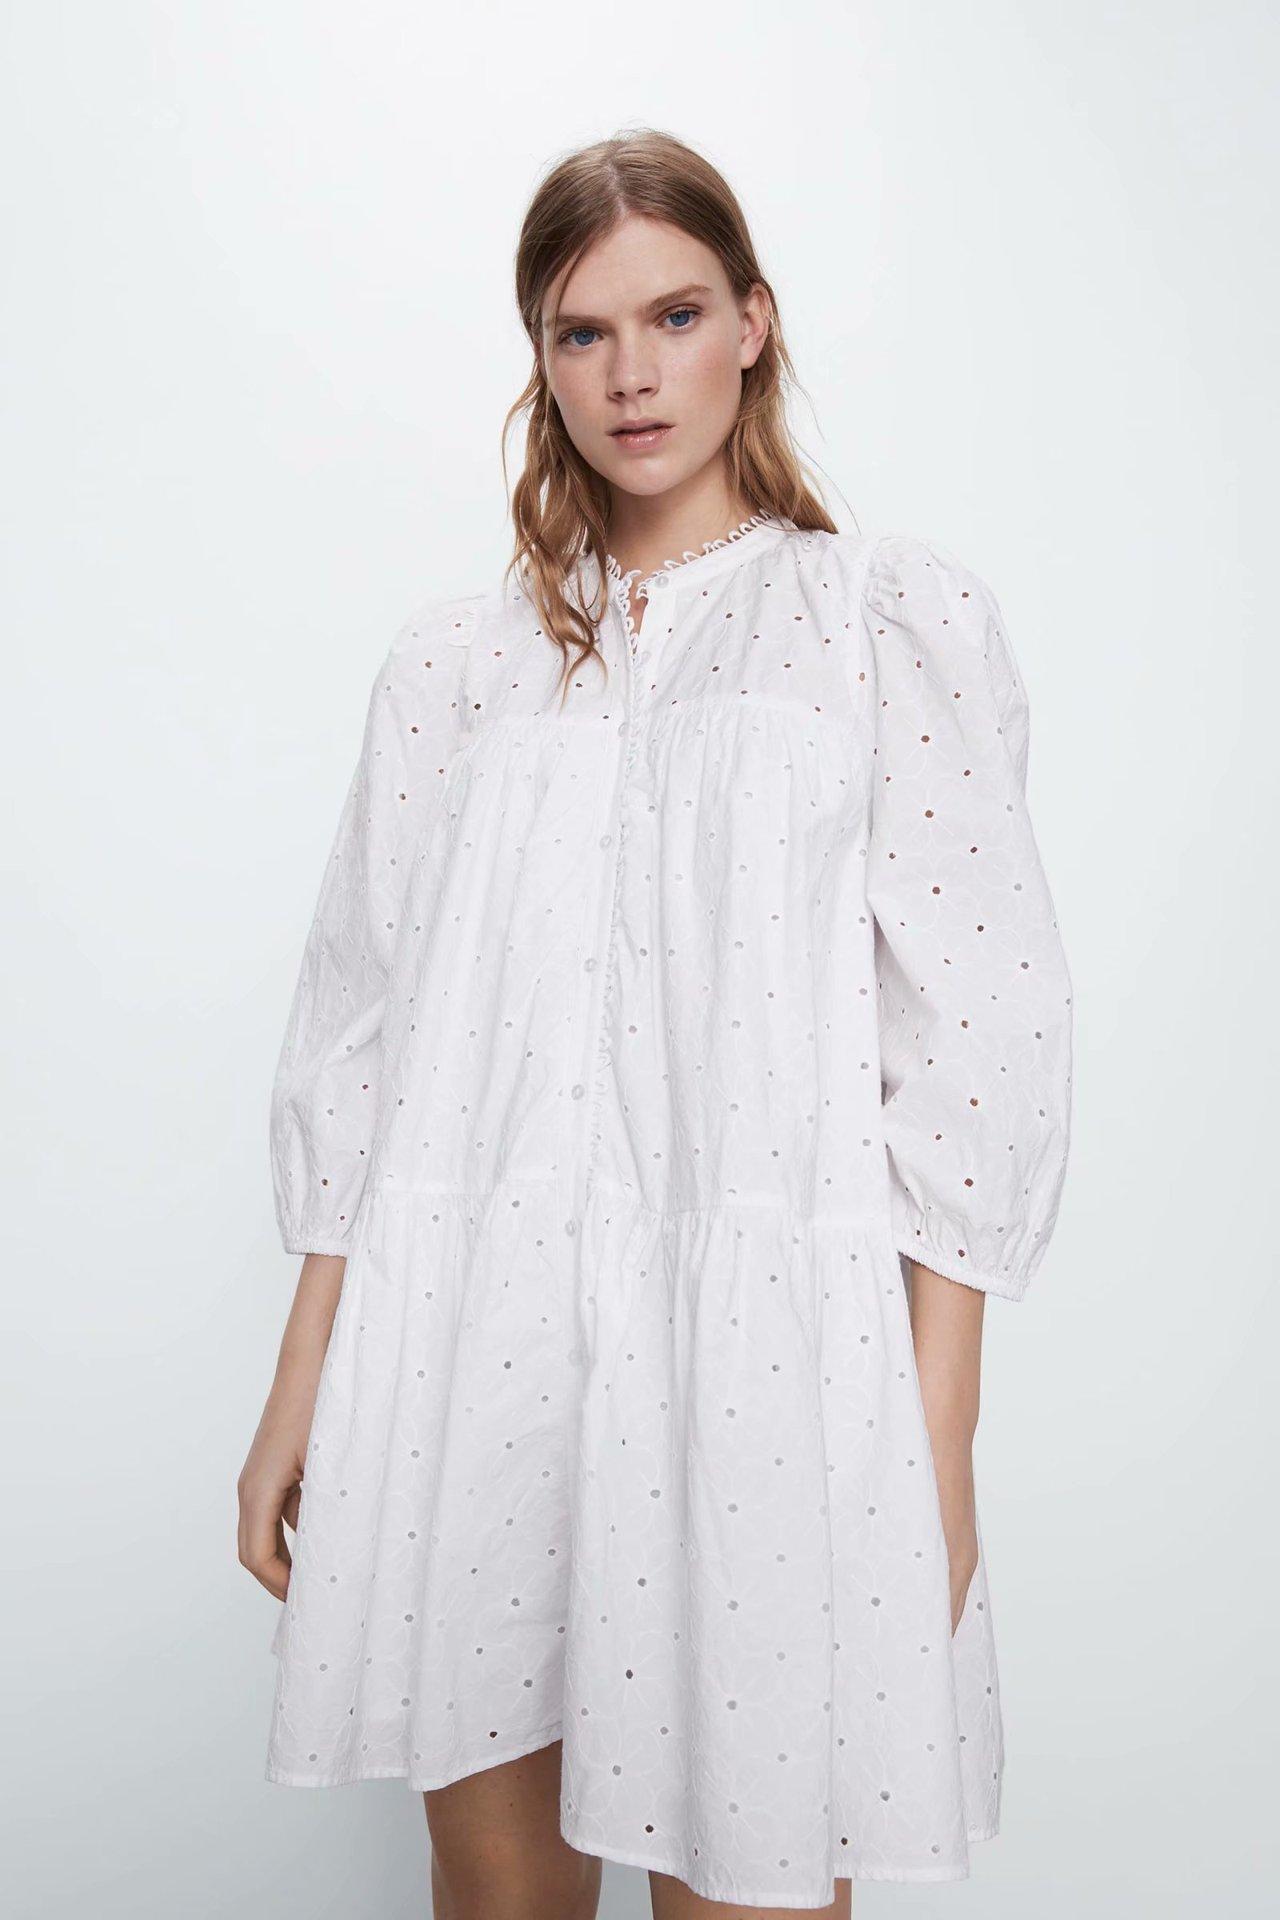 2020 Spring Summer New Style European Hollow Embroided Female White Dress Zaraing Vadiming Sheining Women Dress